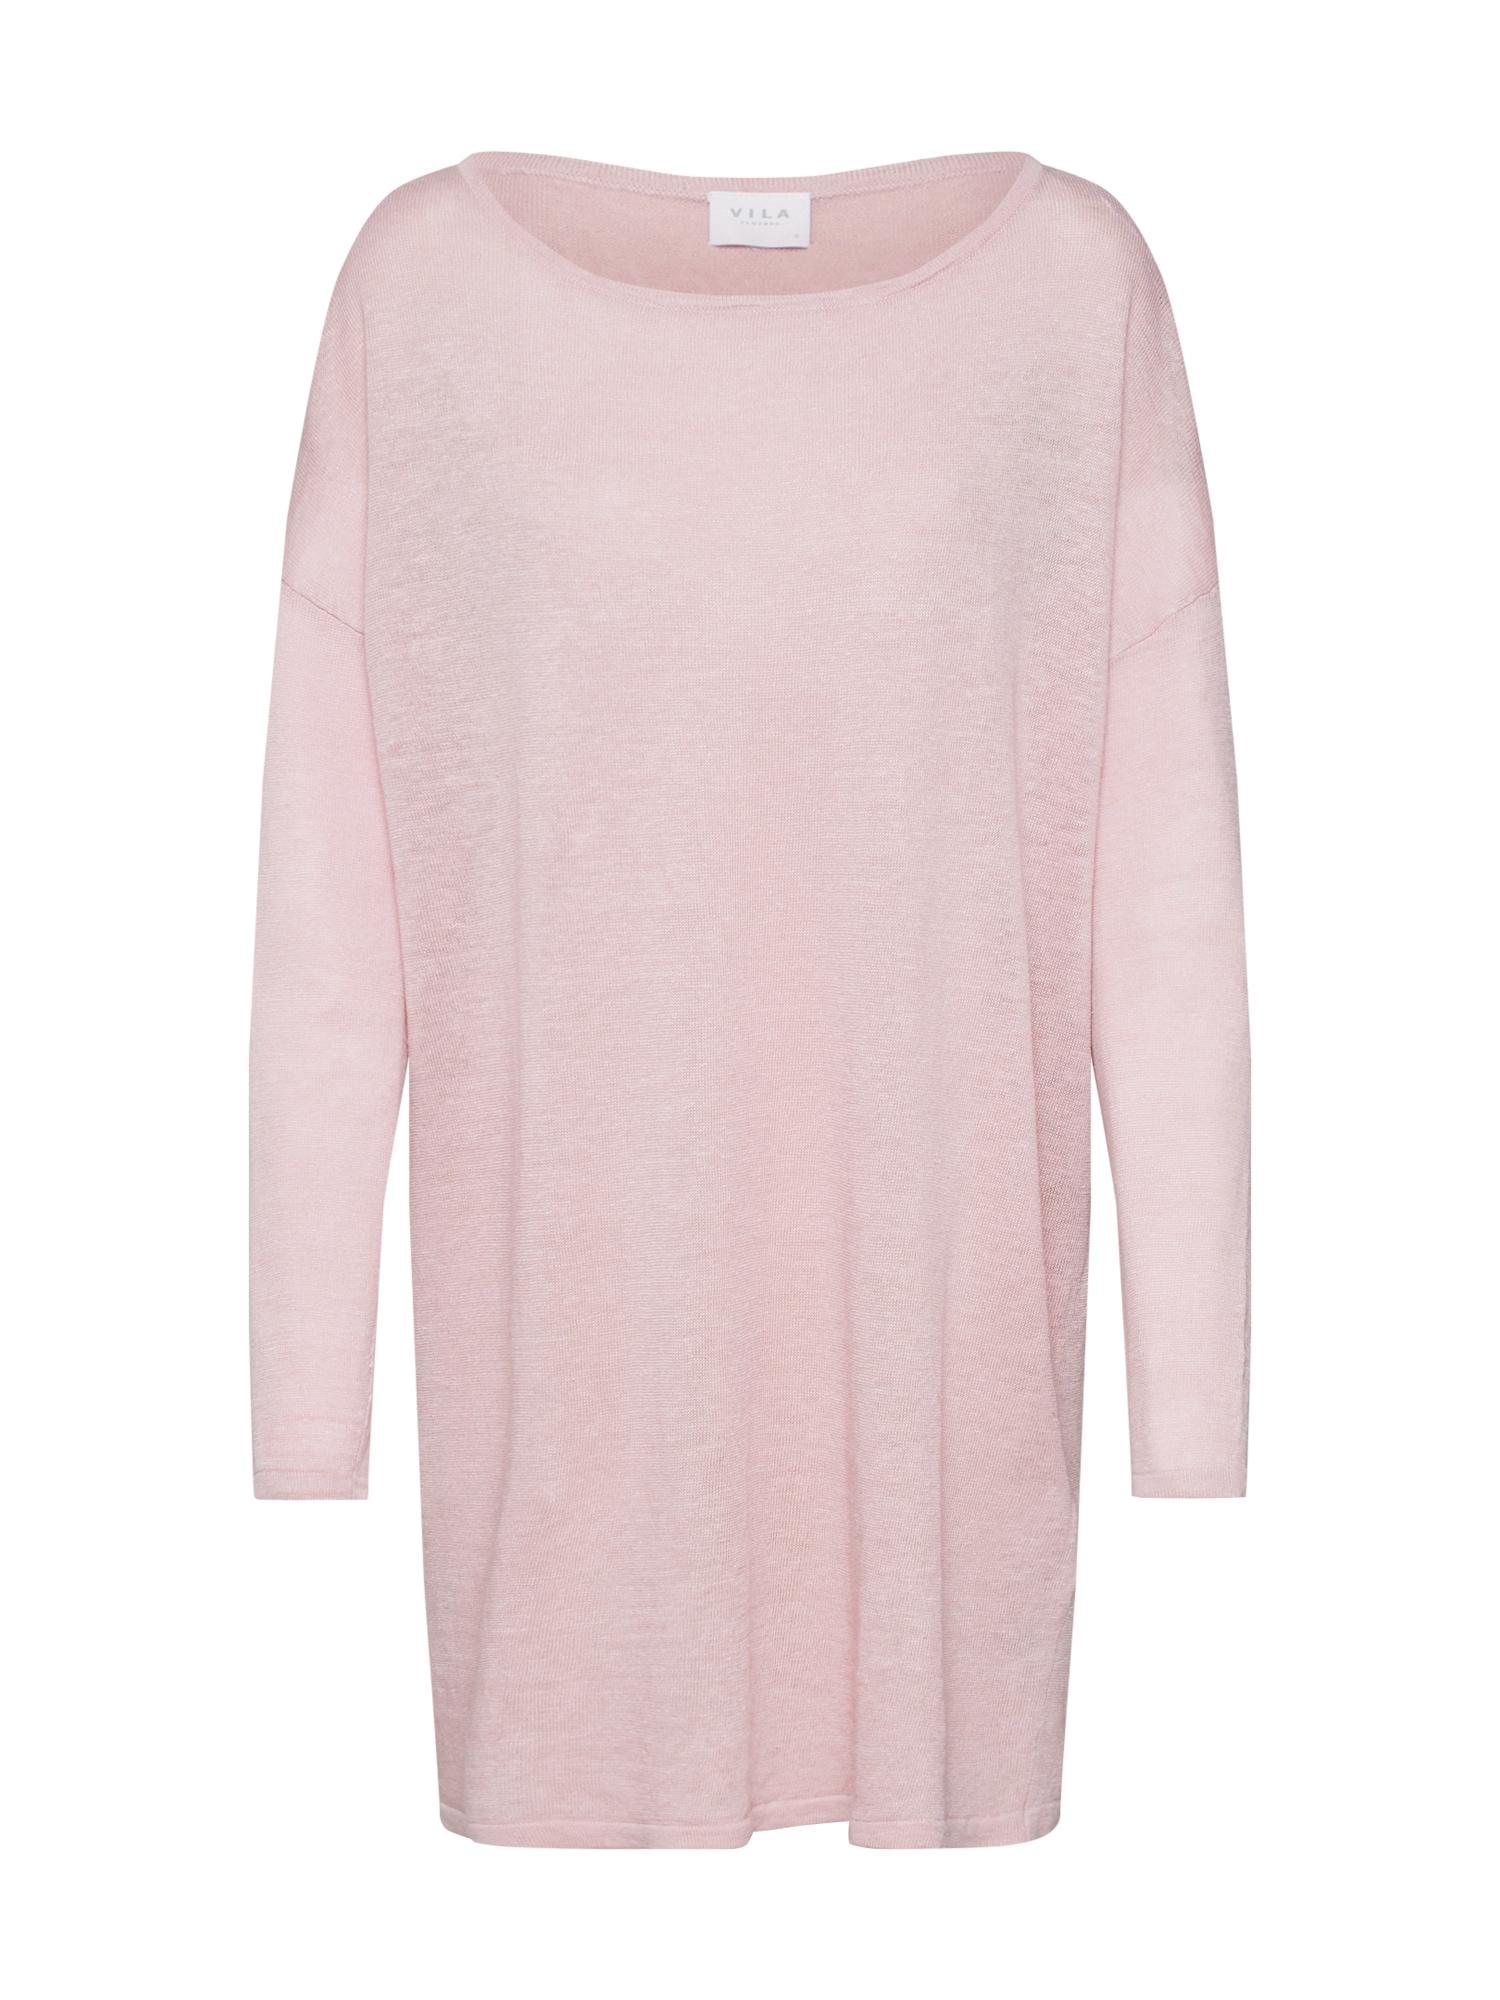 VILA Oversize sveter  ružová